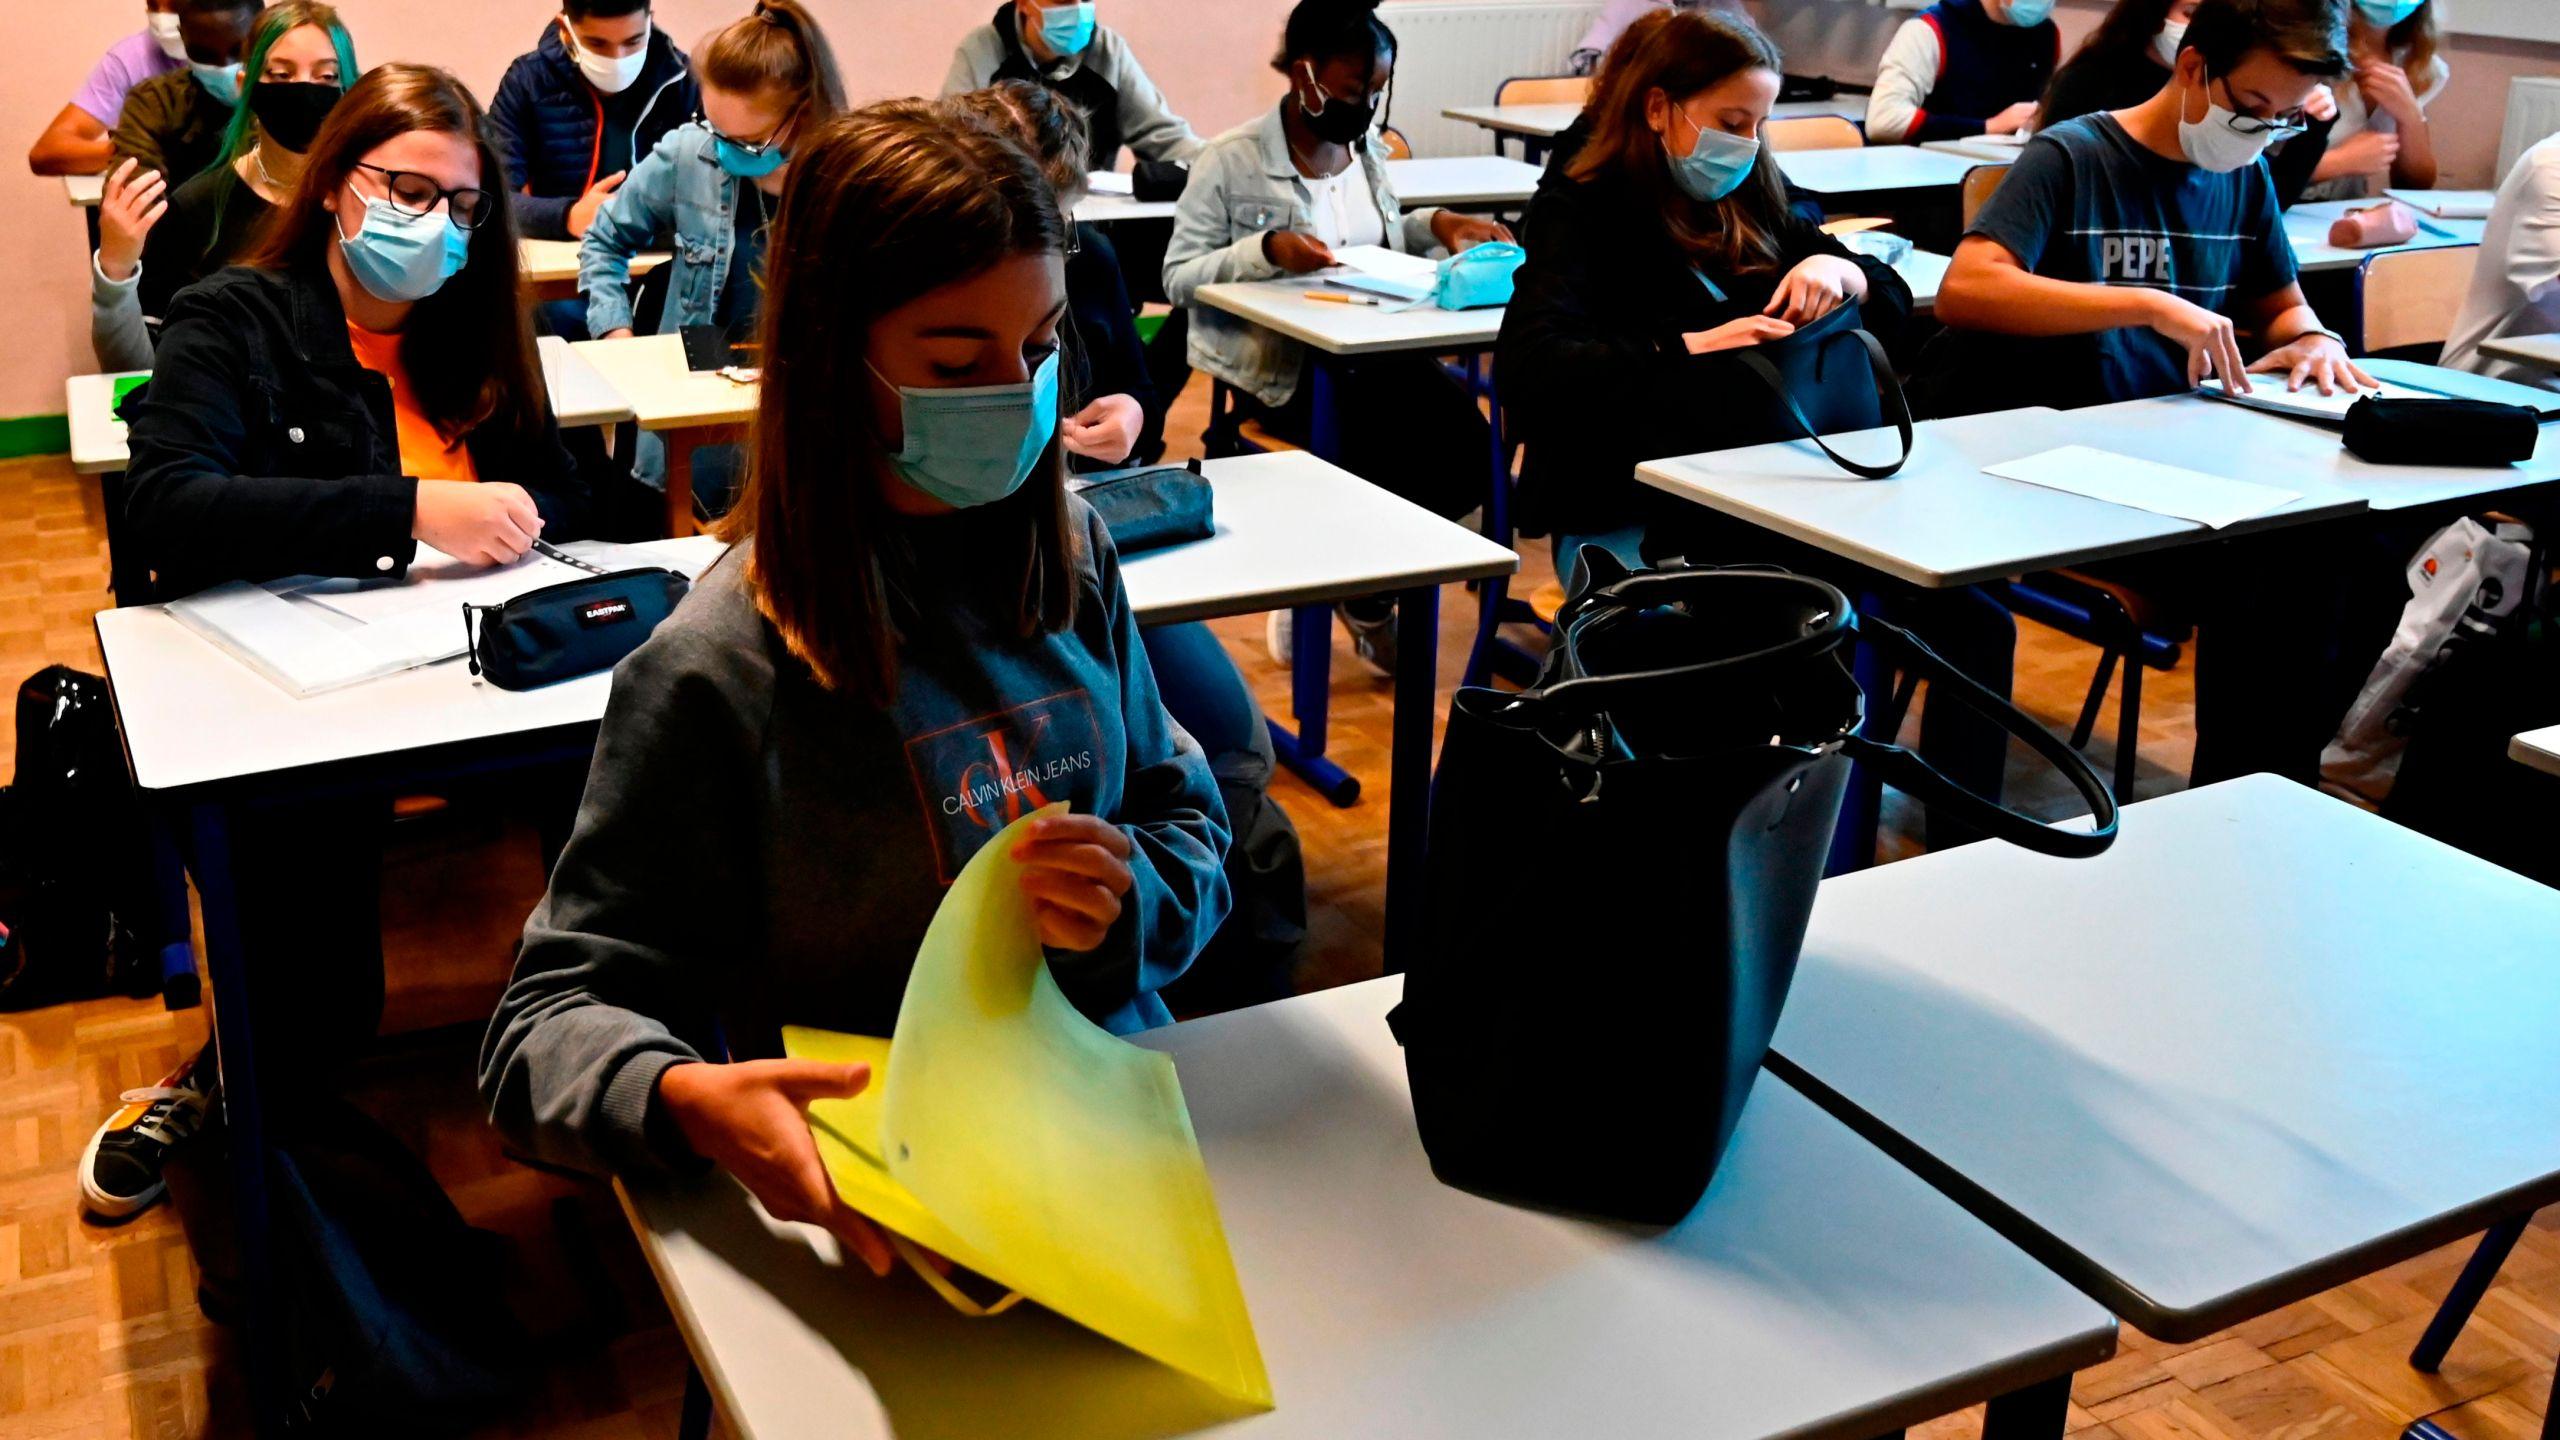 GettyImages- School Masks